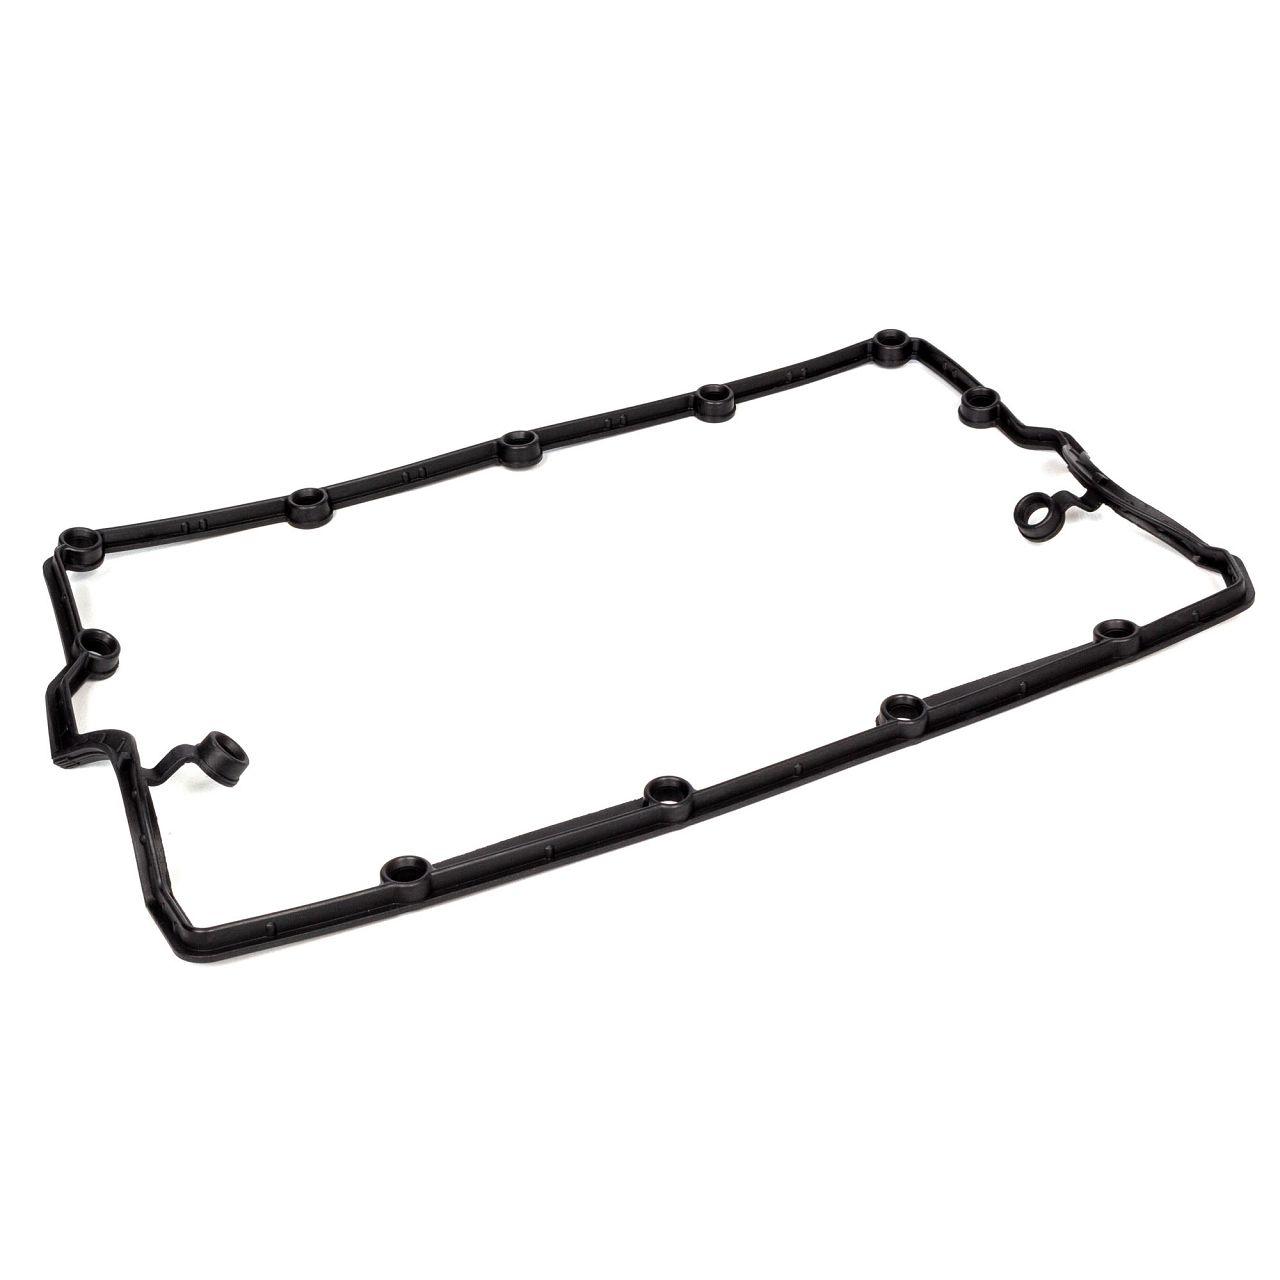 Ventildeckeldichtung Zylinderkopfhaube für AUDI FORD SEAT SKODA VW 1.9TDI 2.0TDI